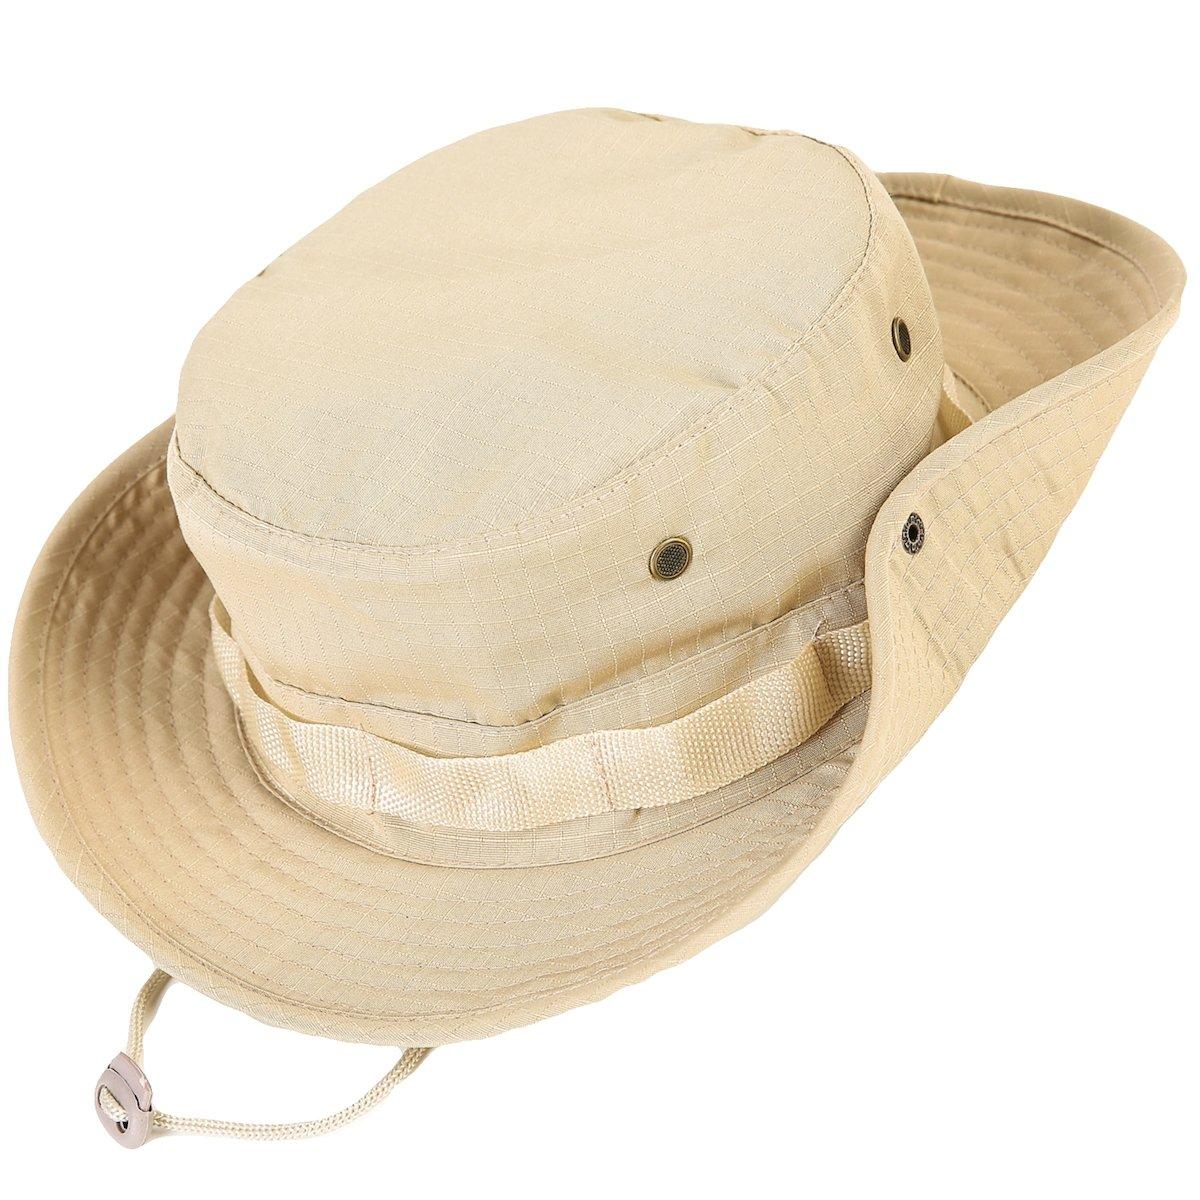 917bb09f73d Kolumb Unisex Military Boonie Hat- Premium Soft Cotton   Polyester Fabric